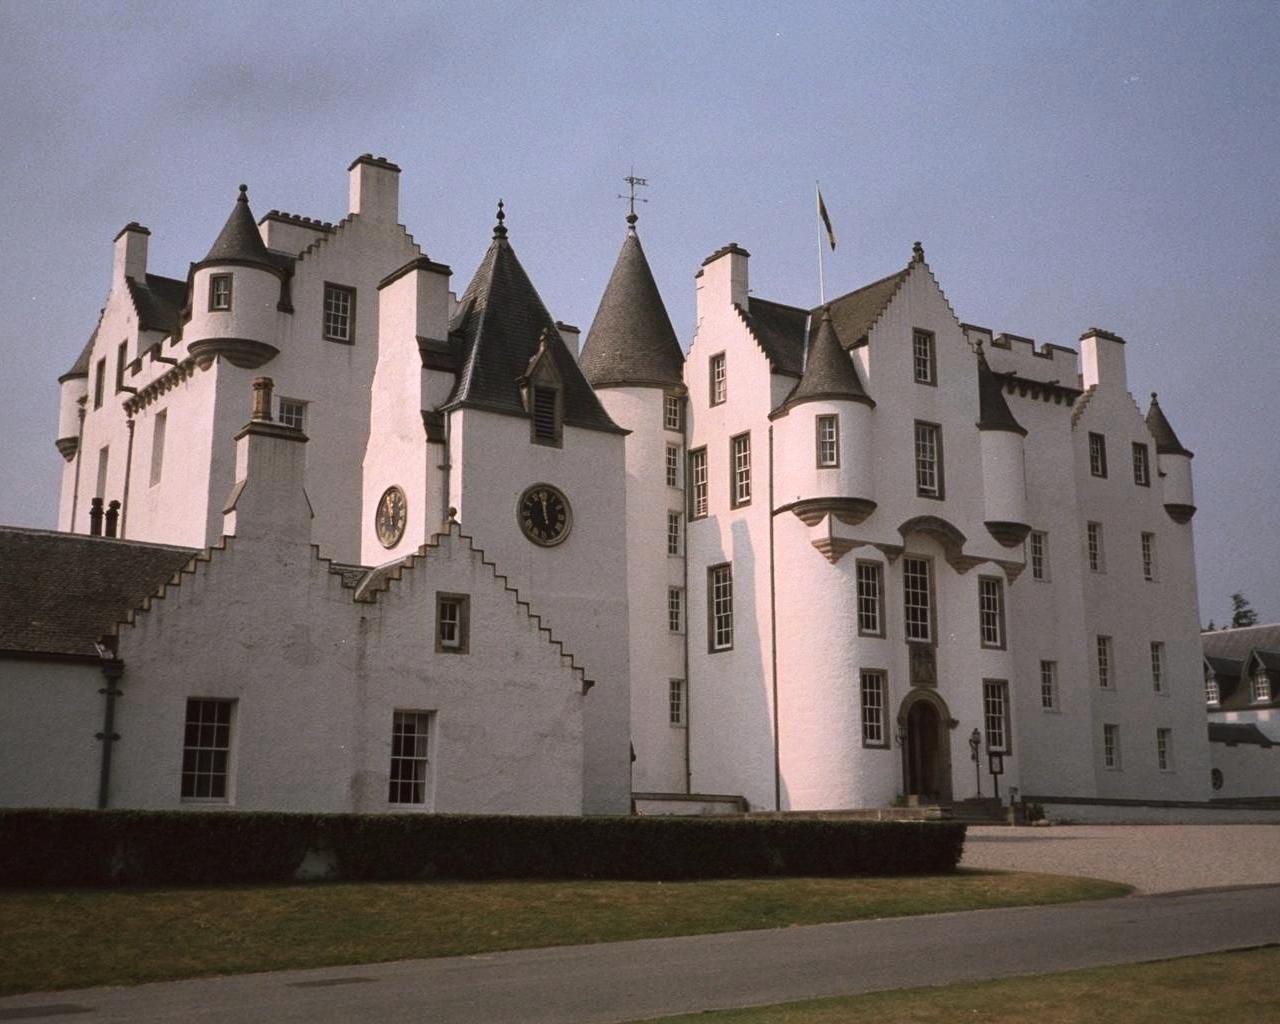 Castle Wallpaper 037